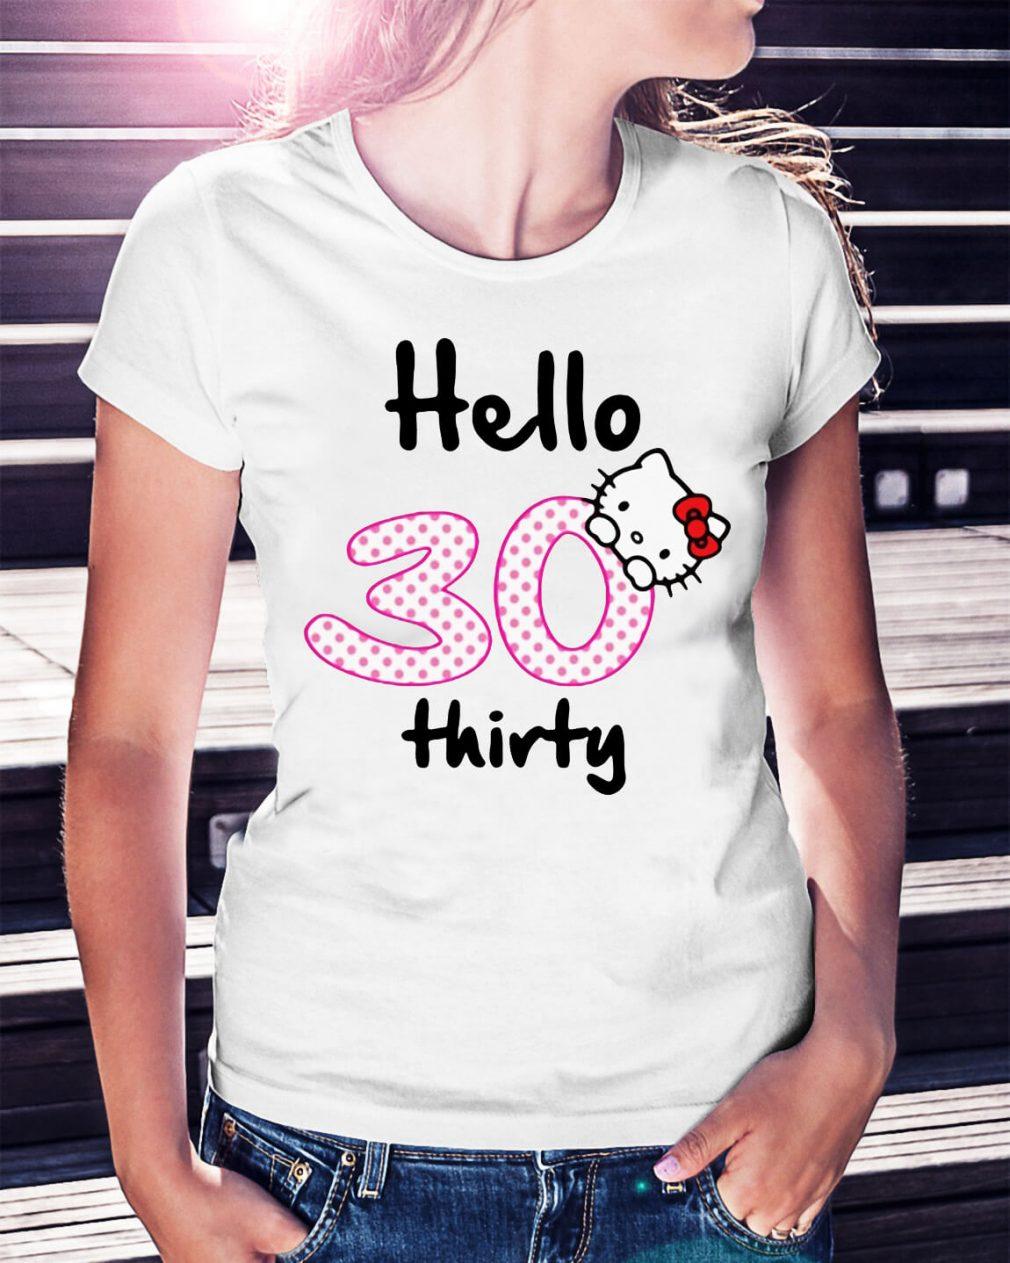 Hello 30 thirty shirt